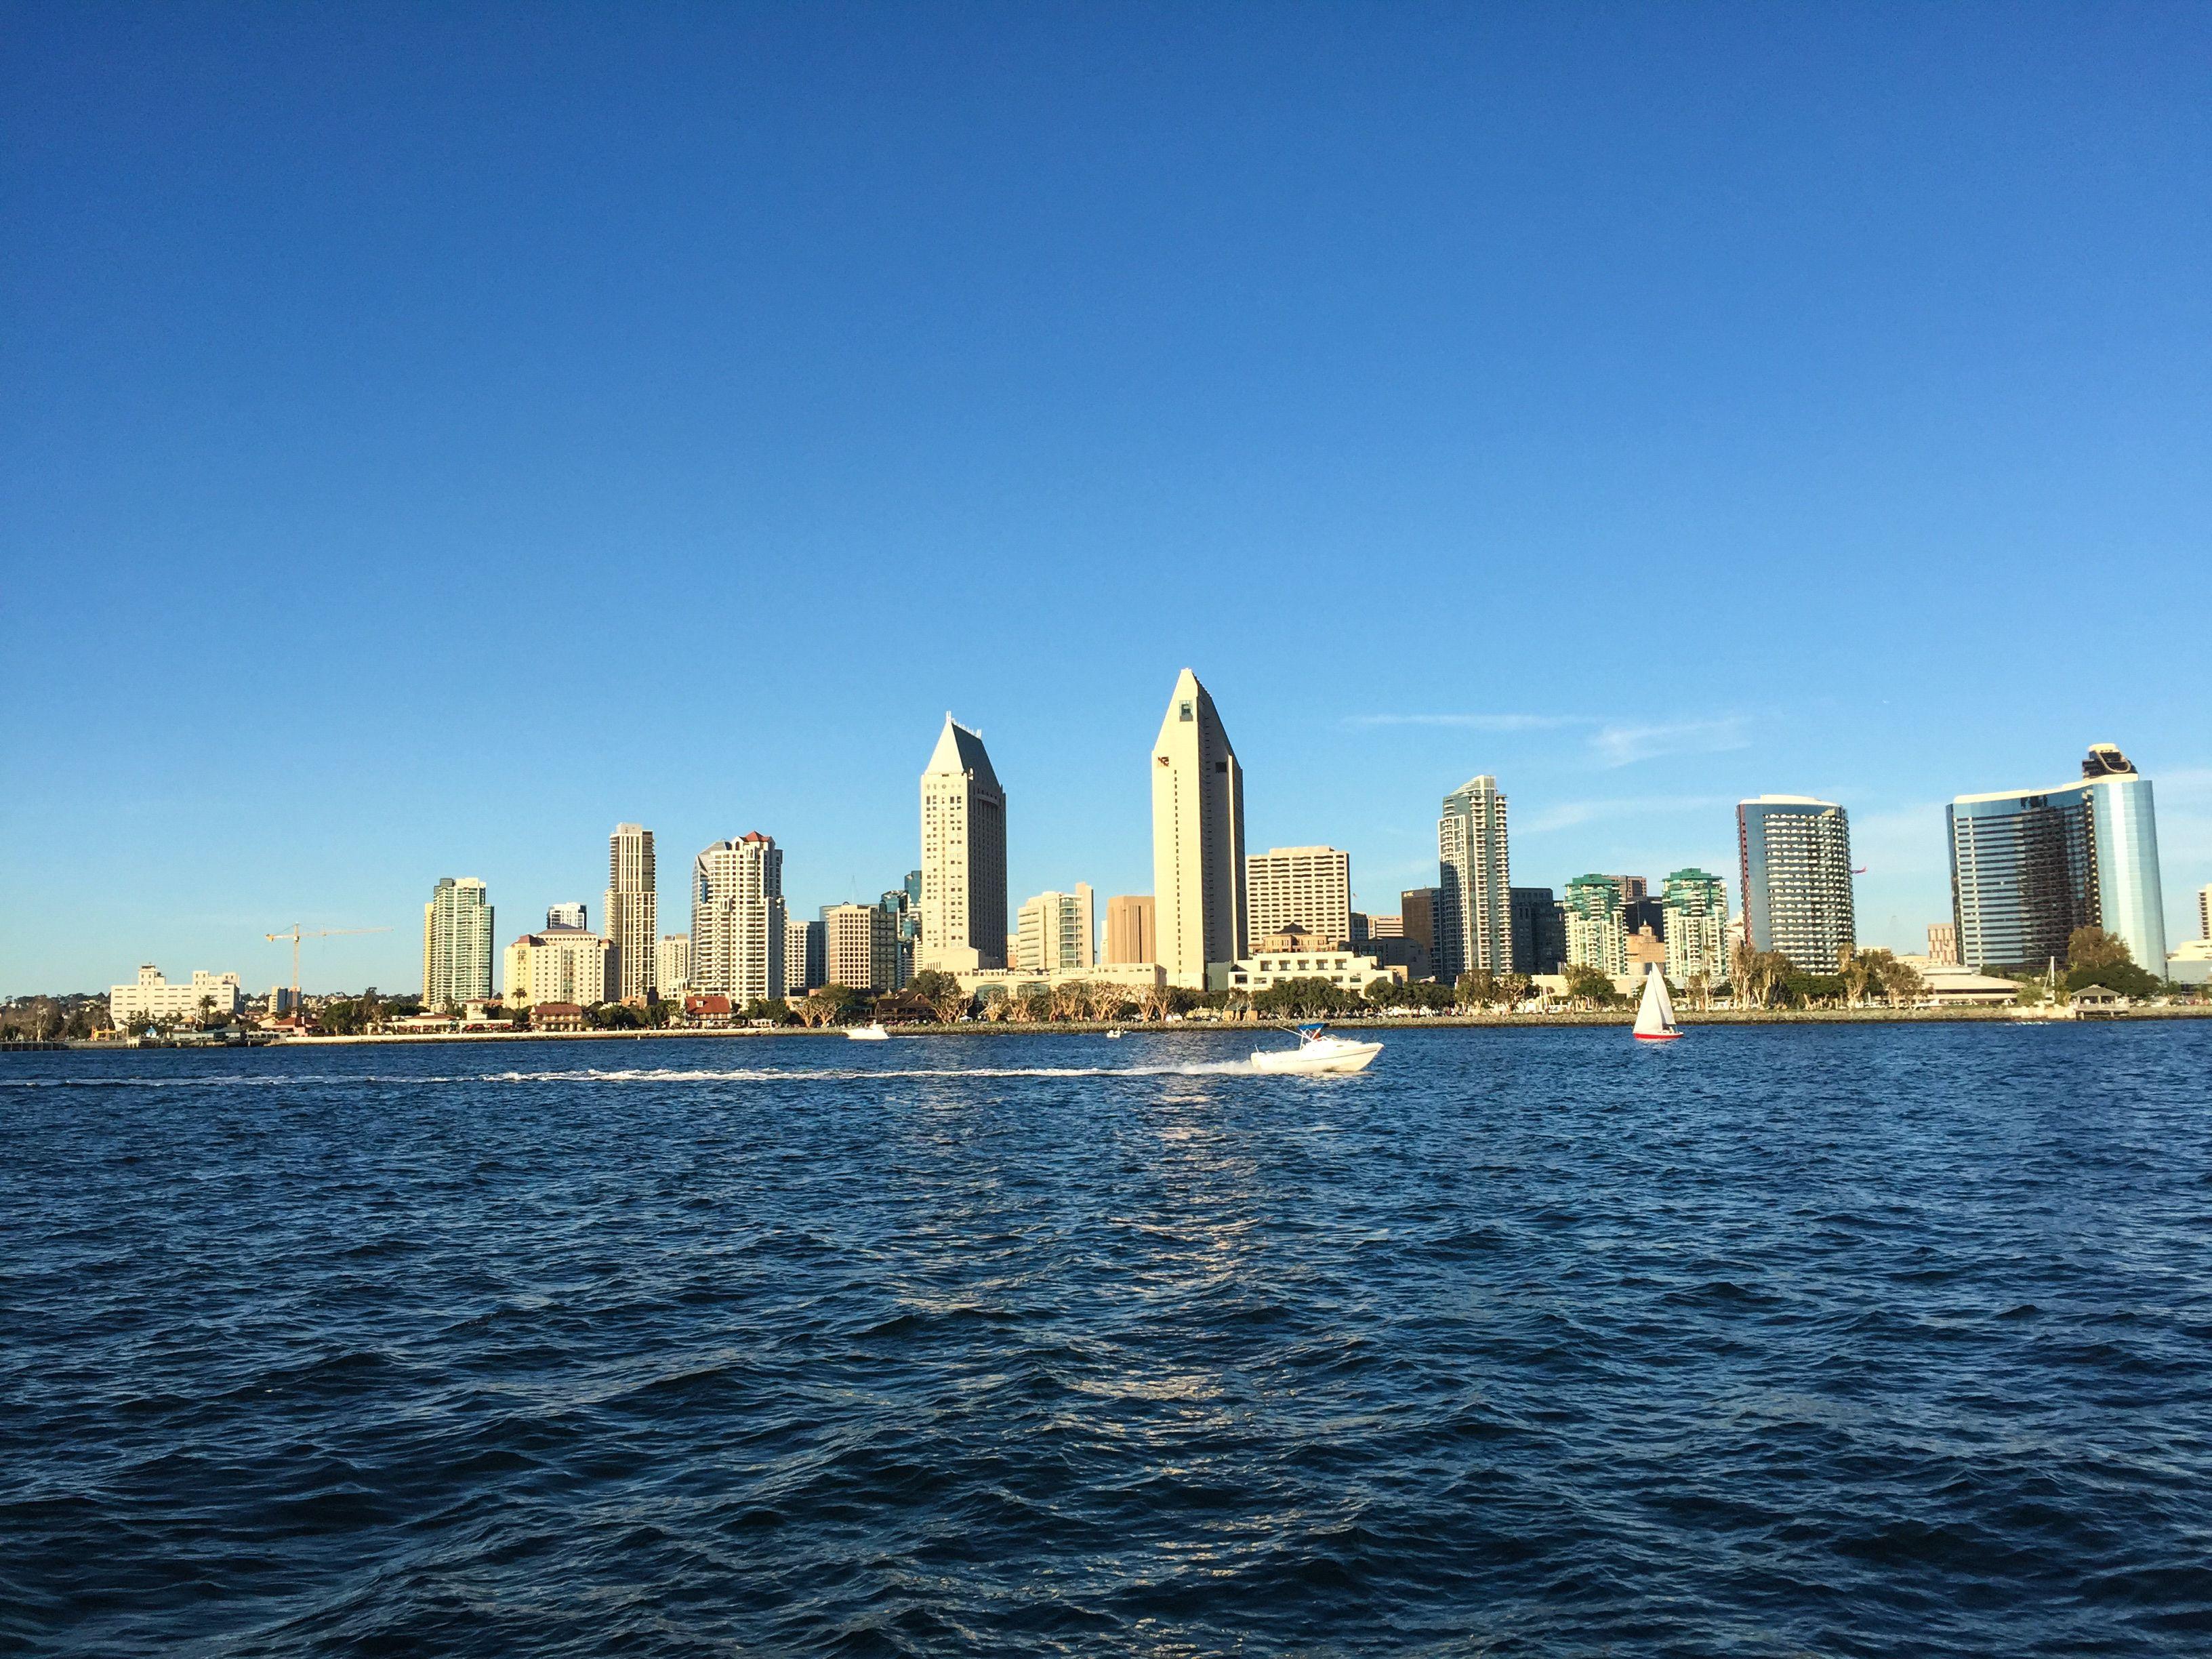 Boating in San Diego Bay